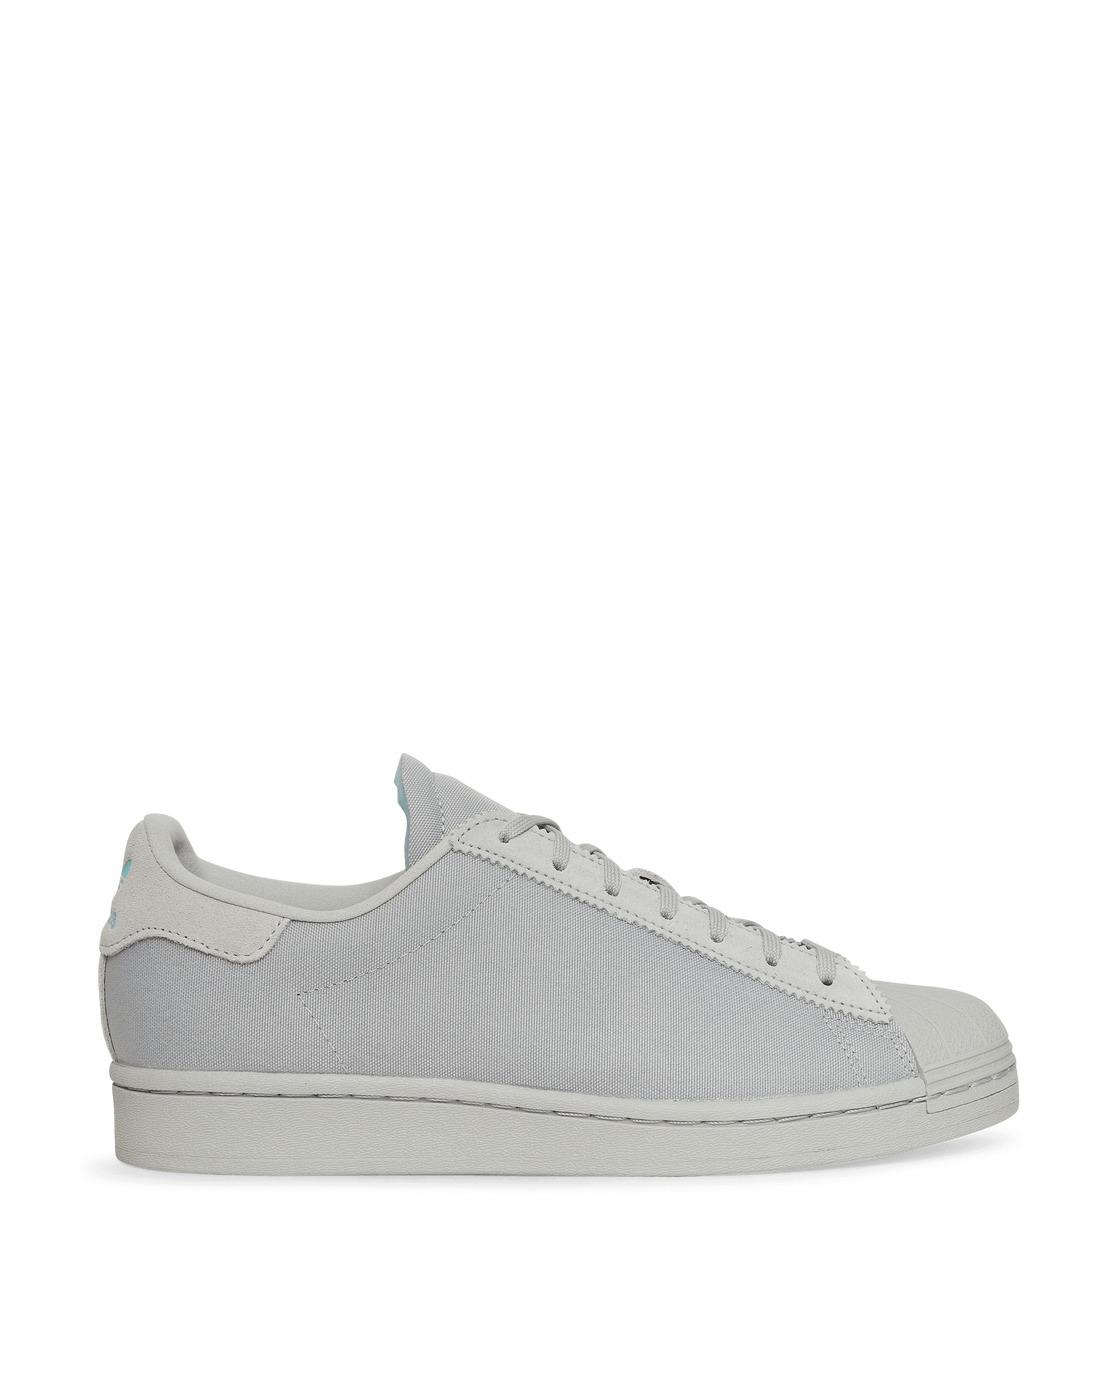 Photo: Adidas Originals Superstar Sneakers Grey Two 38